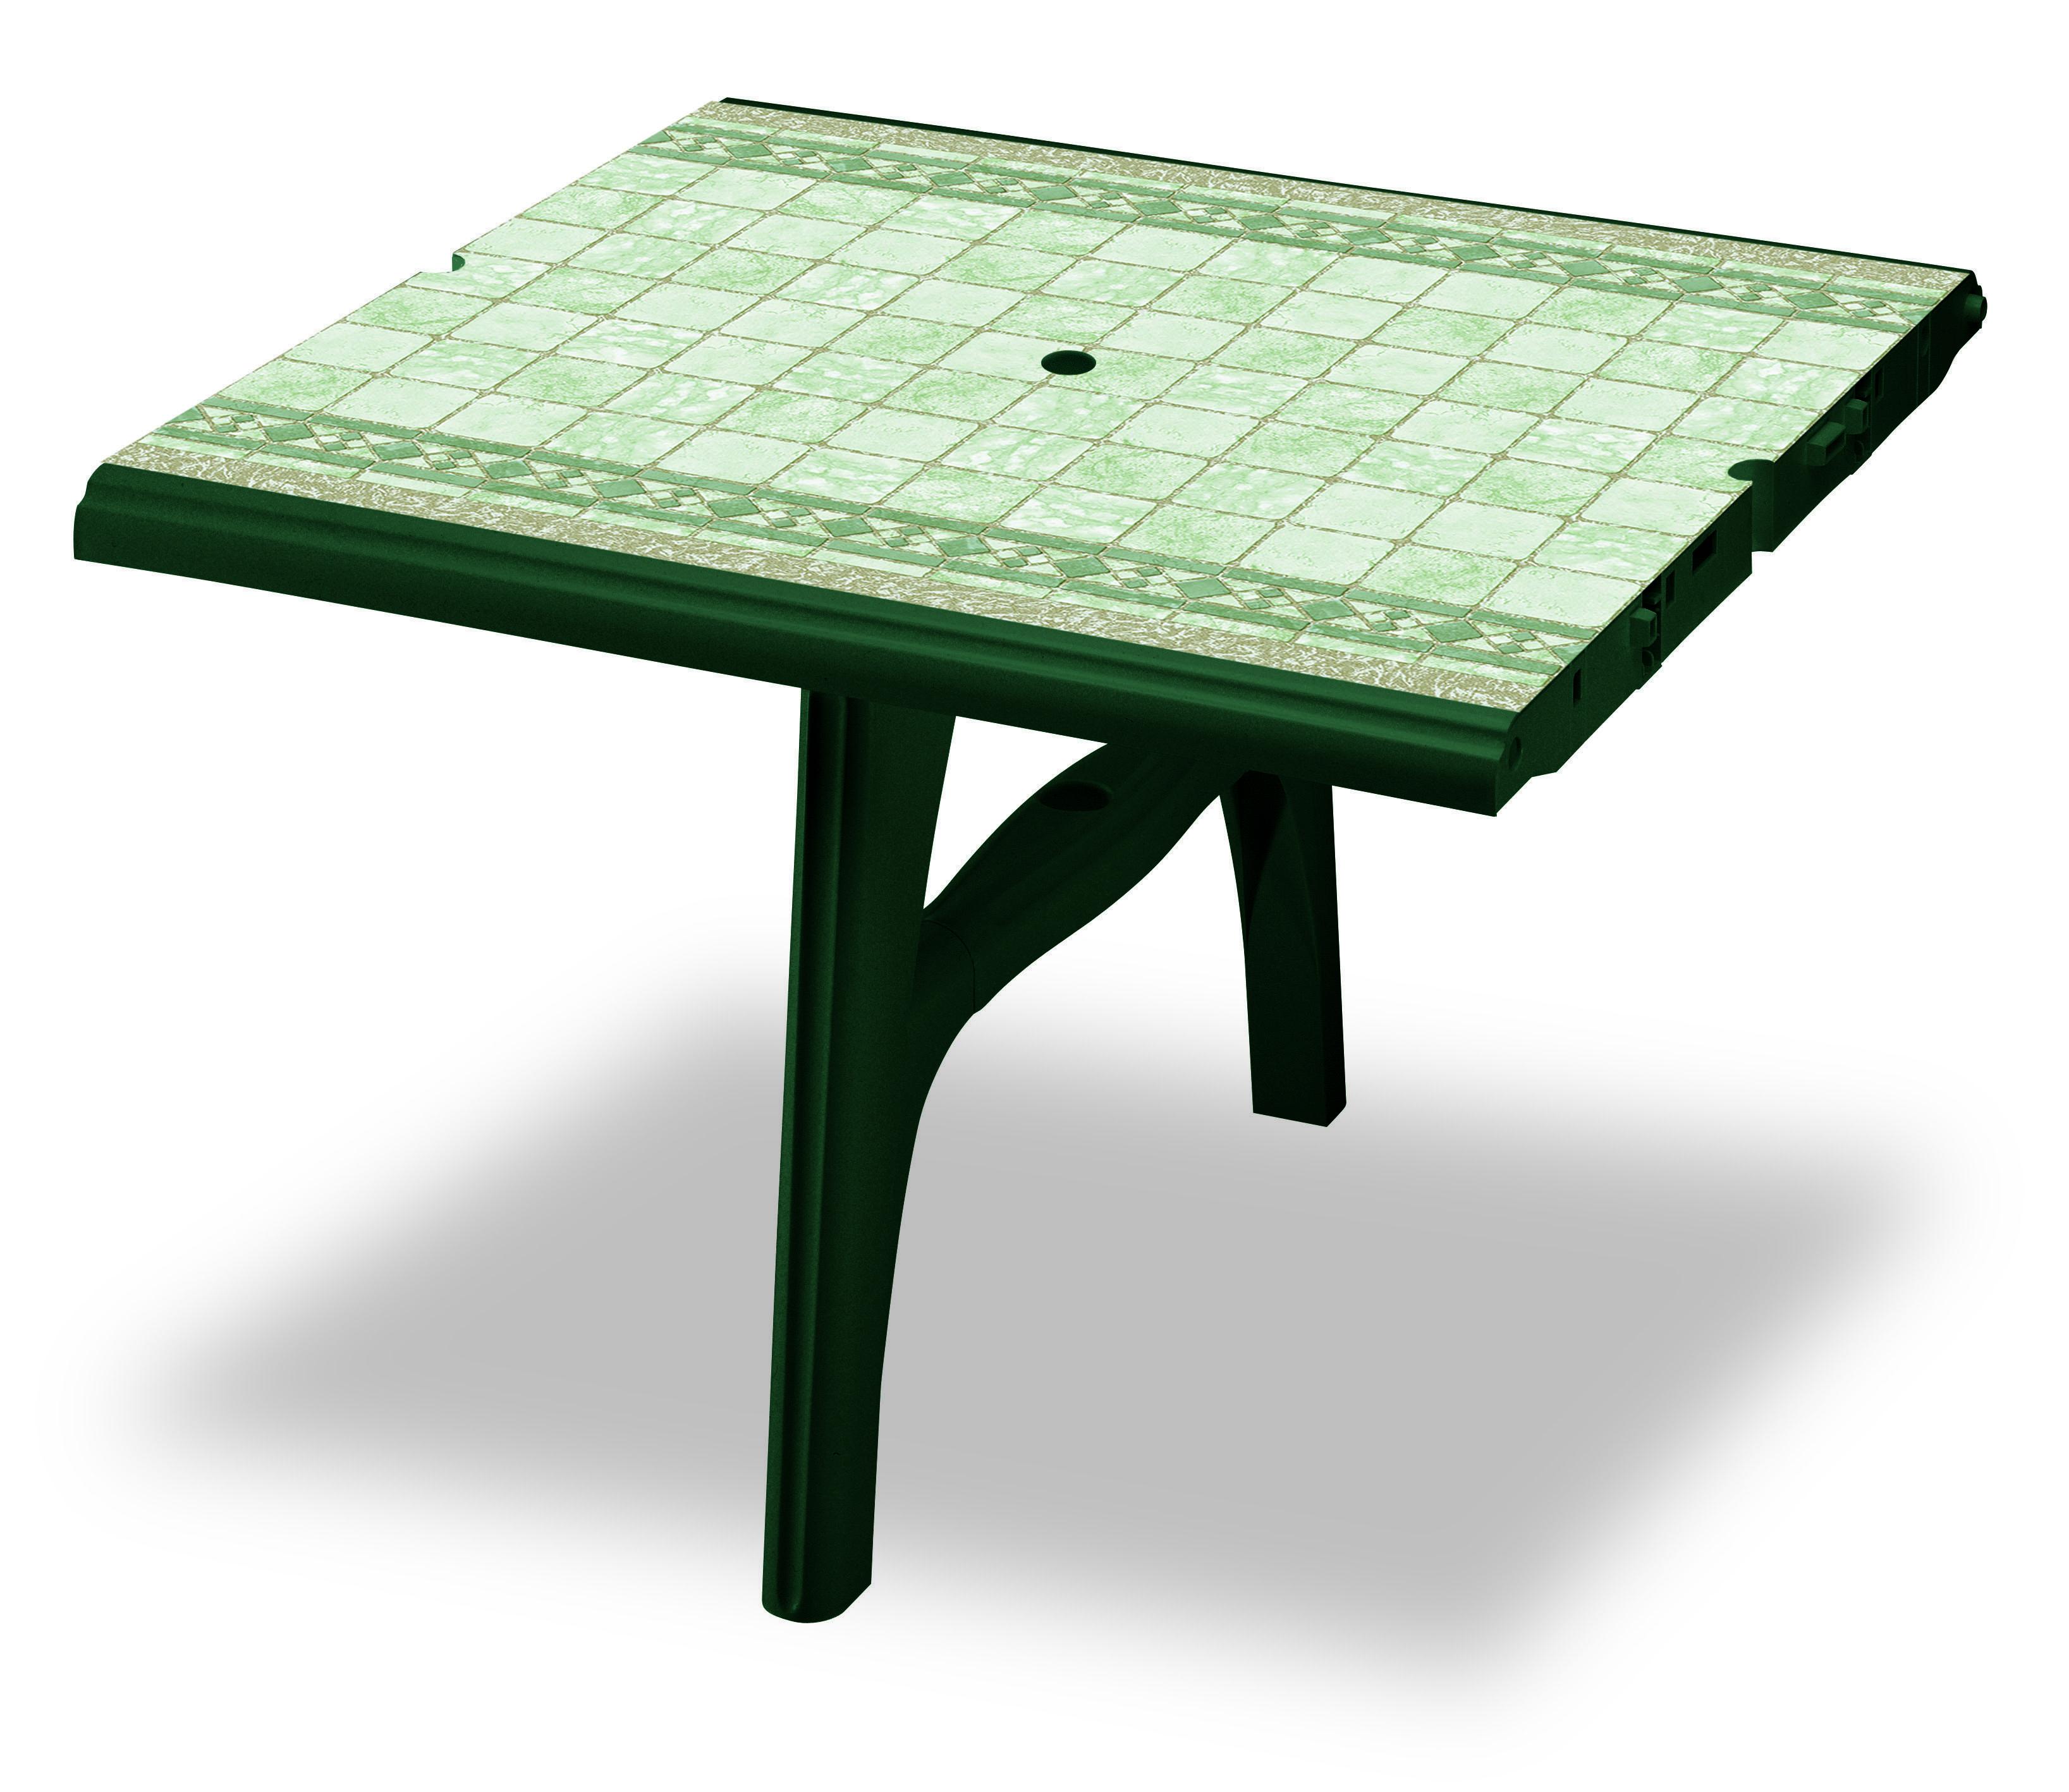 Tavolo Sedie Giardino Plastica.Prolunga In Resina Per Tavolo Da Giardino President 3000 By Scab